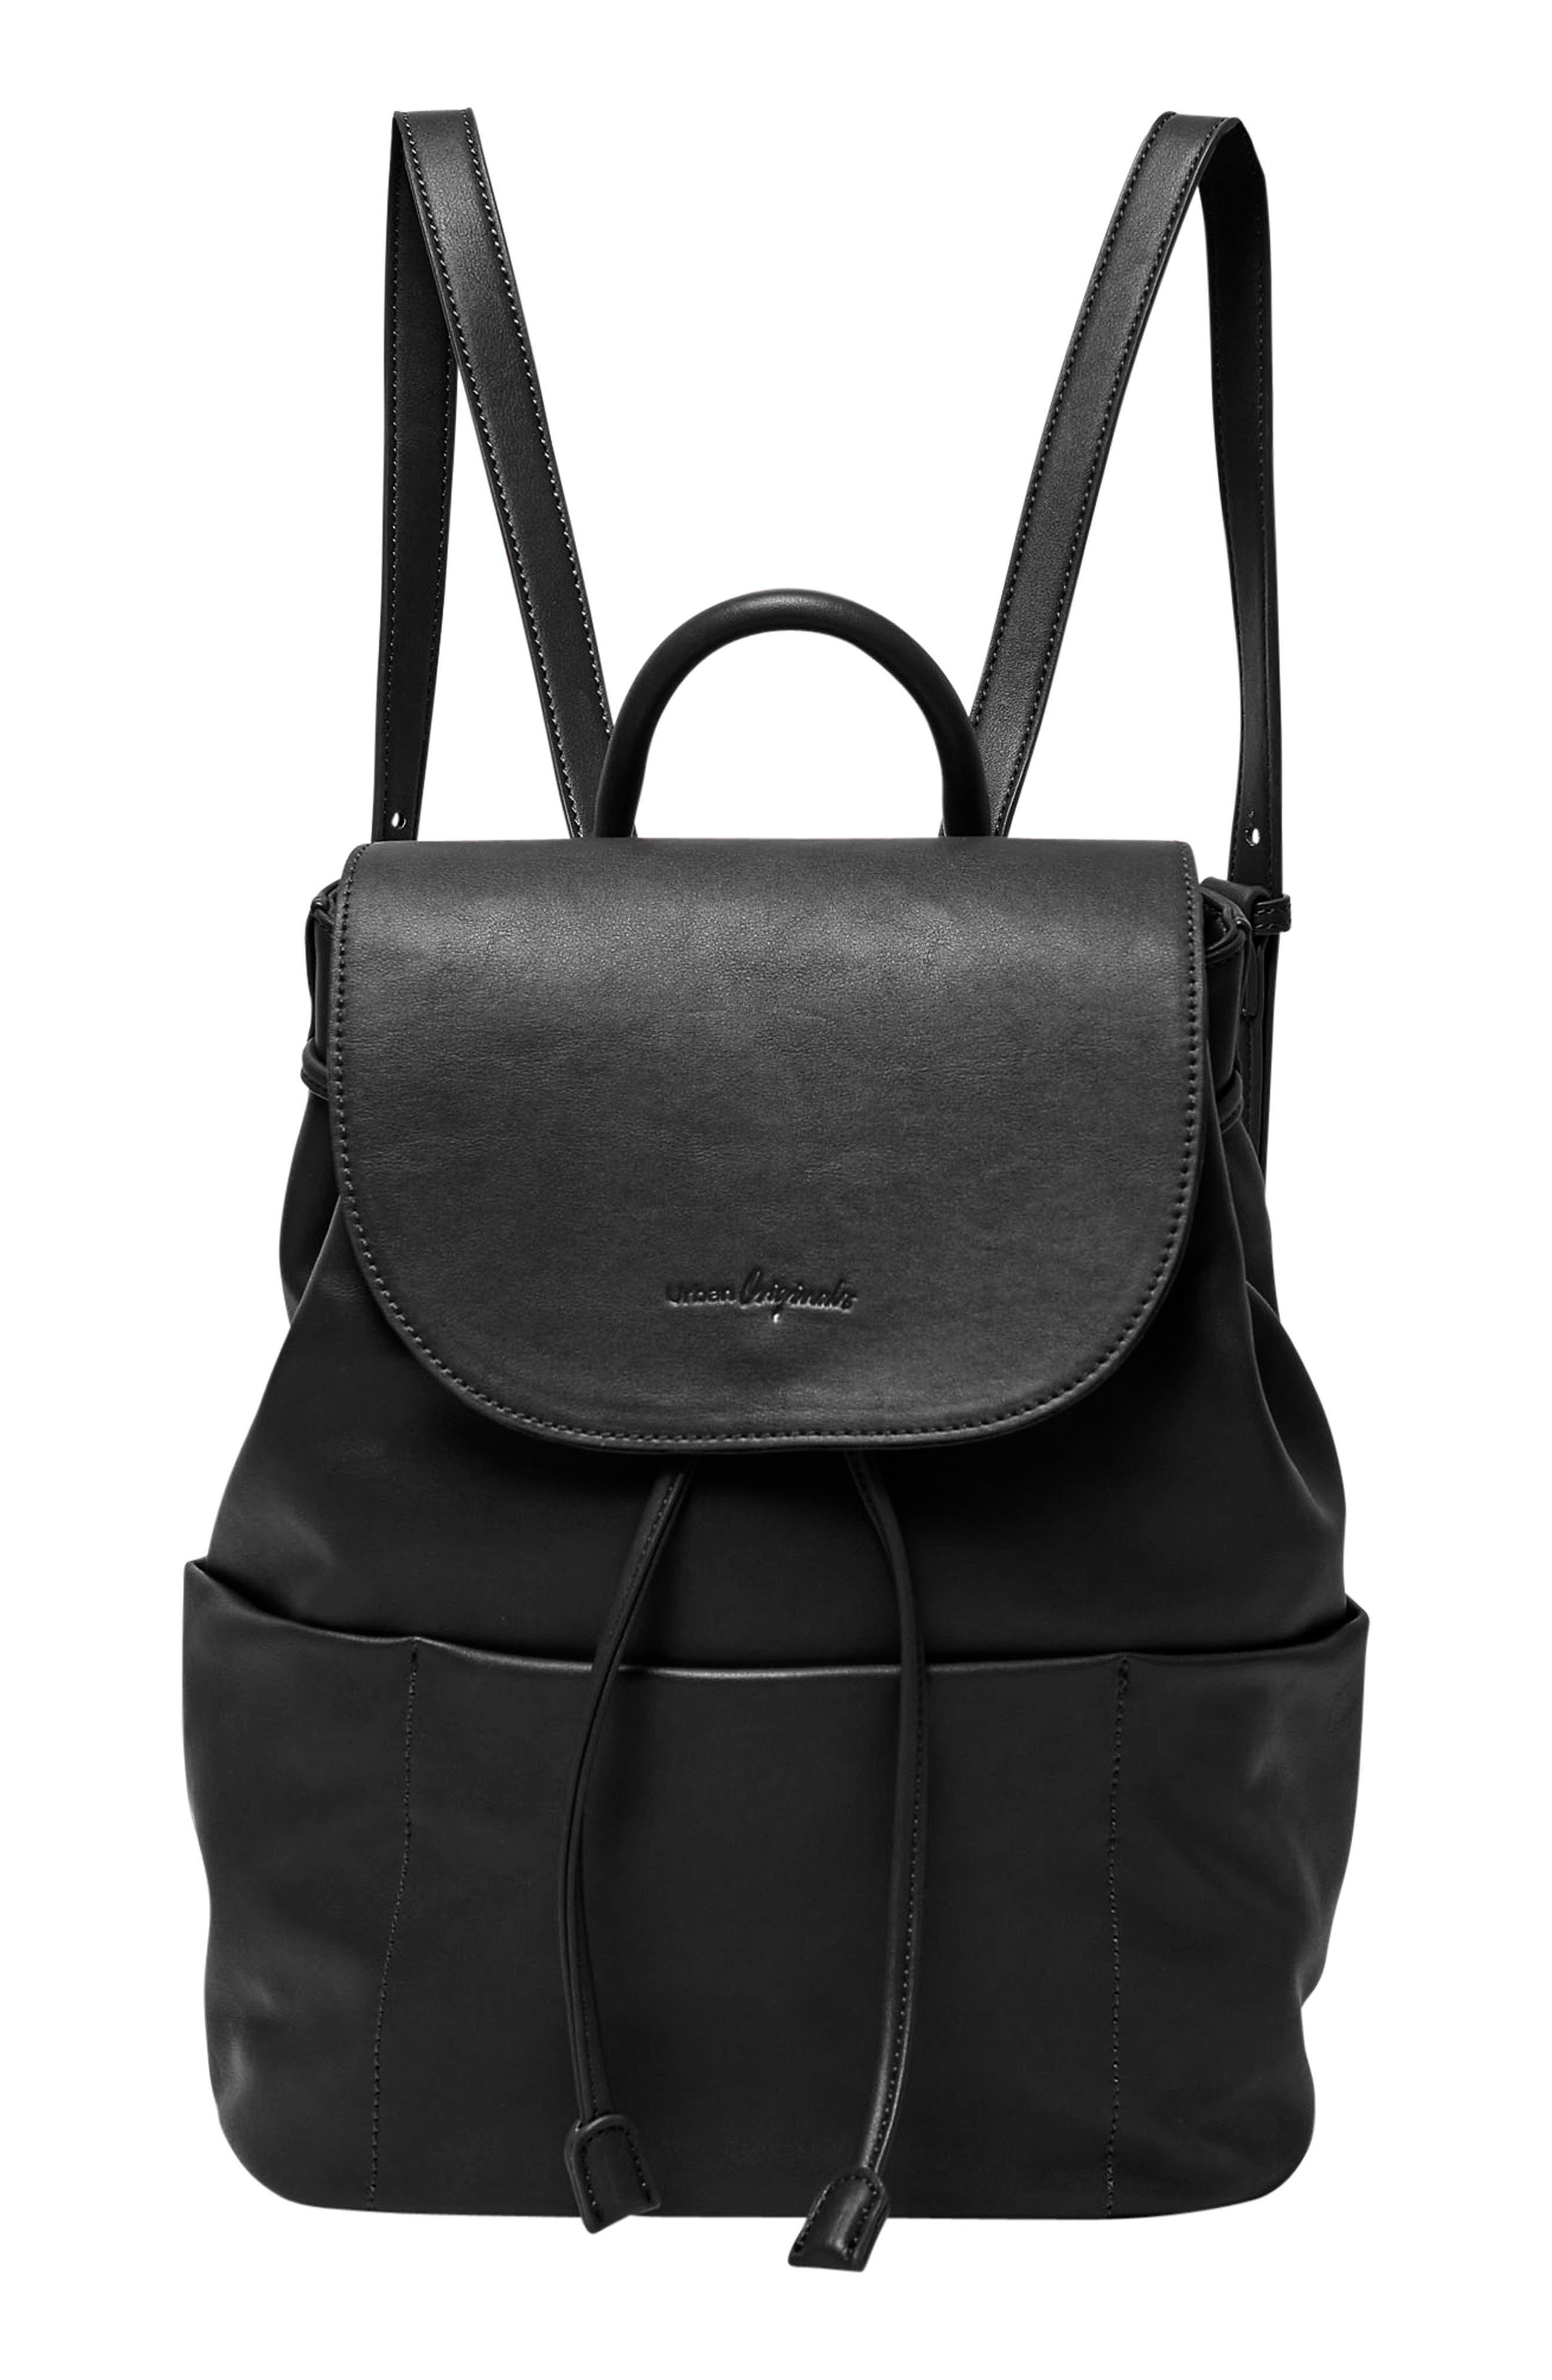 Splendour Vegan Leather Backpack,                         Main,                         color, 002